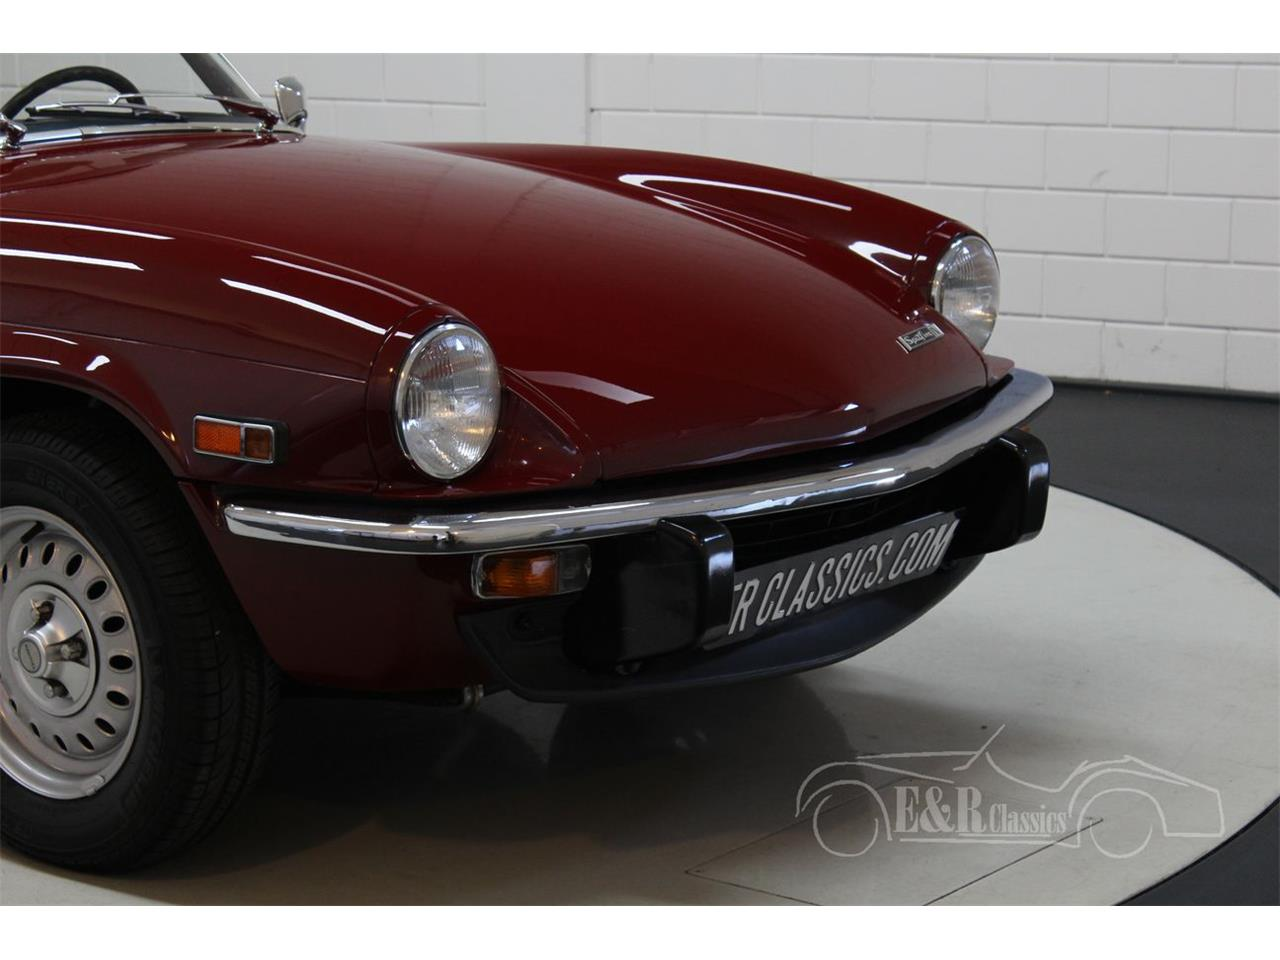 1971 Triumph Spitfire (CC-1303105) for sale in Waalwijk, Noord-Brabant